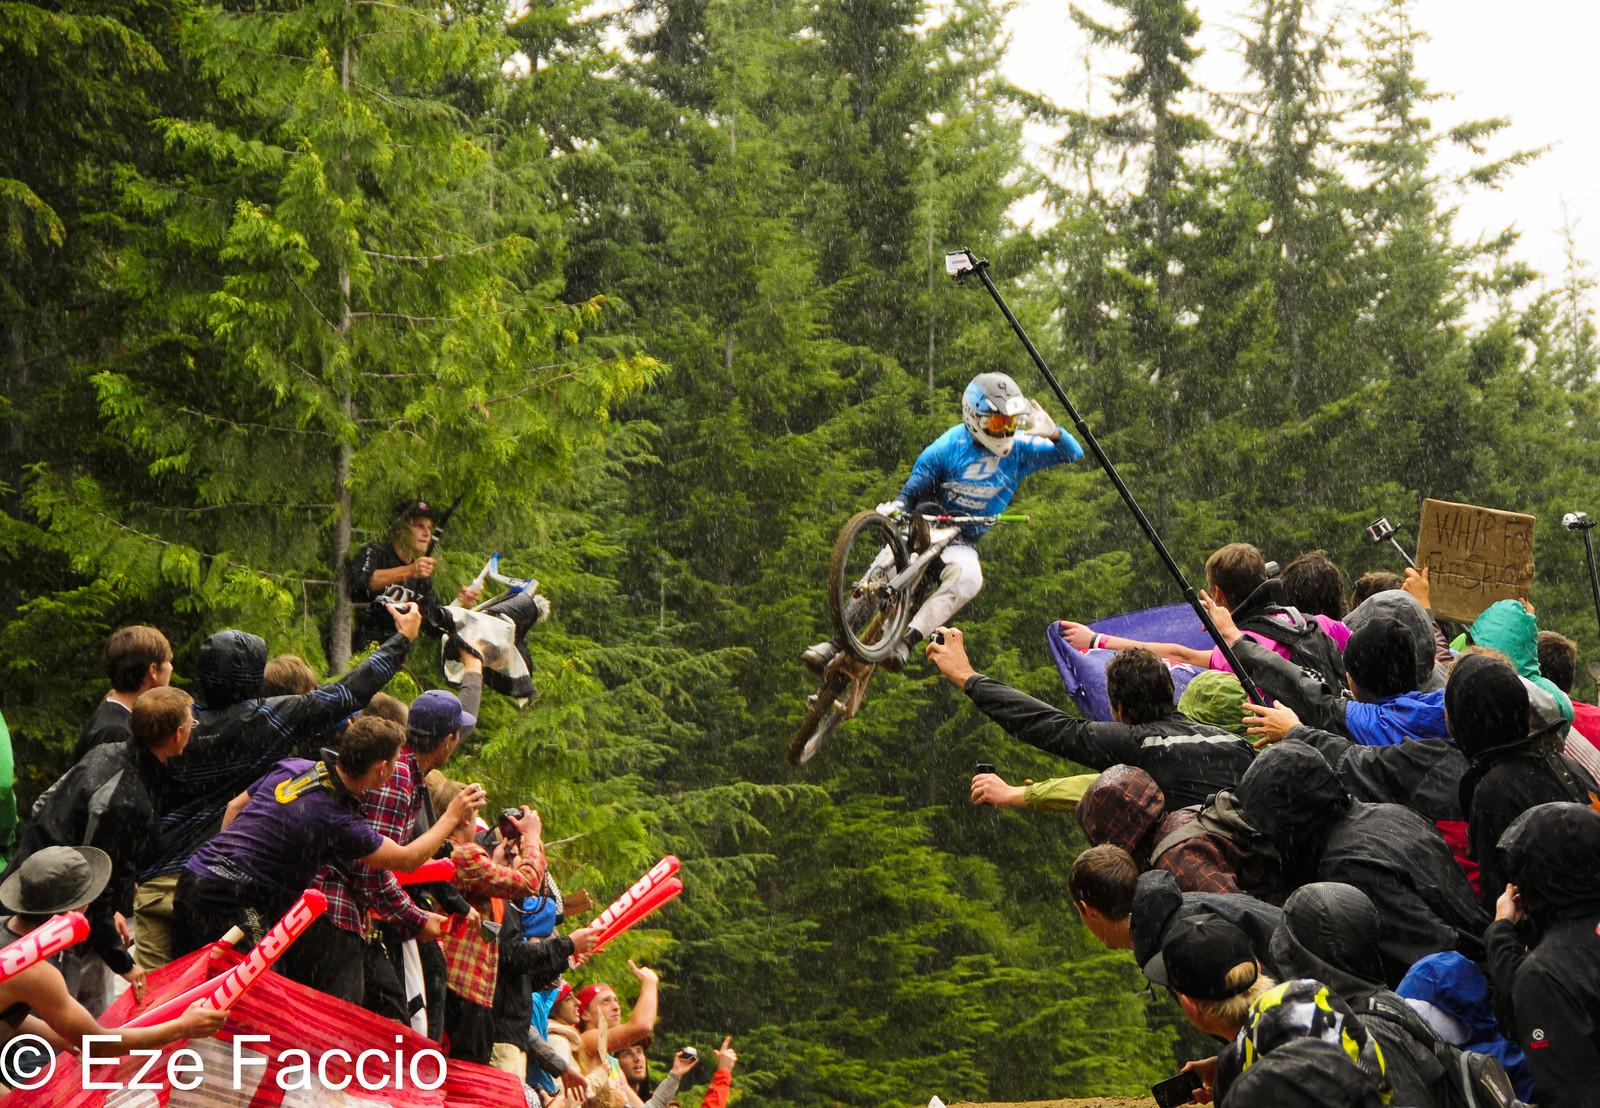 Whip of the wolrd - ezefaccio - Mountain Biking Pictures - Vital MTB